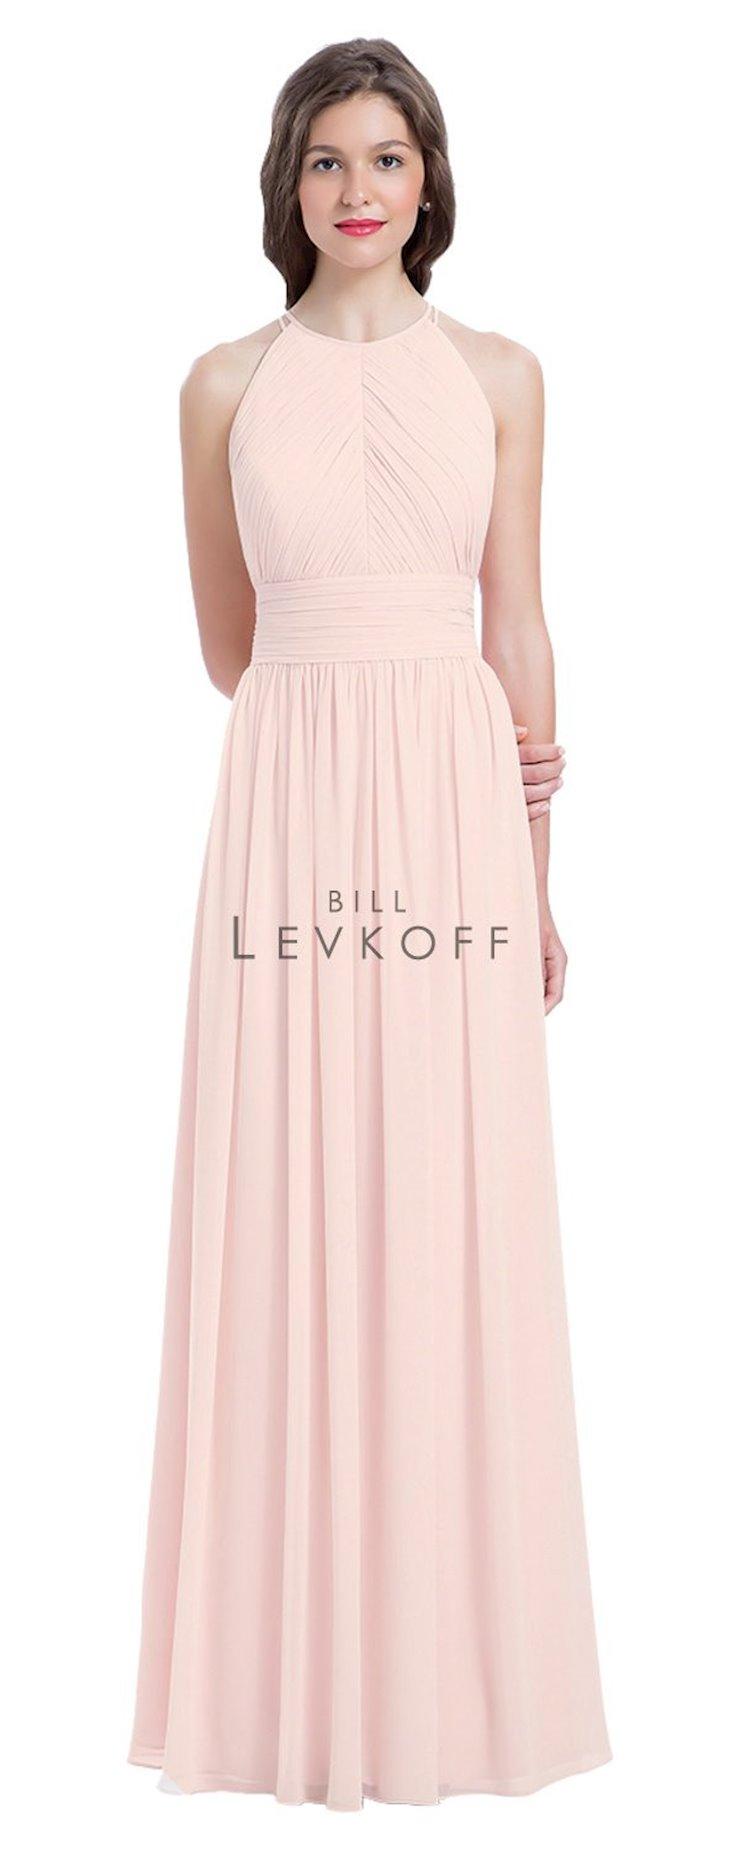 Bill Levkoff Style #1161